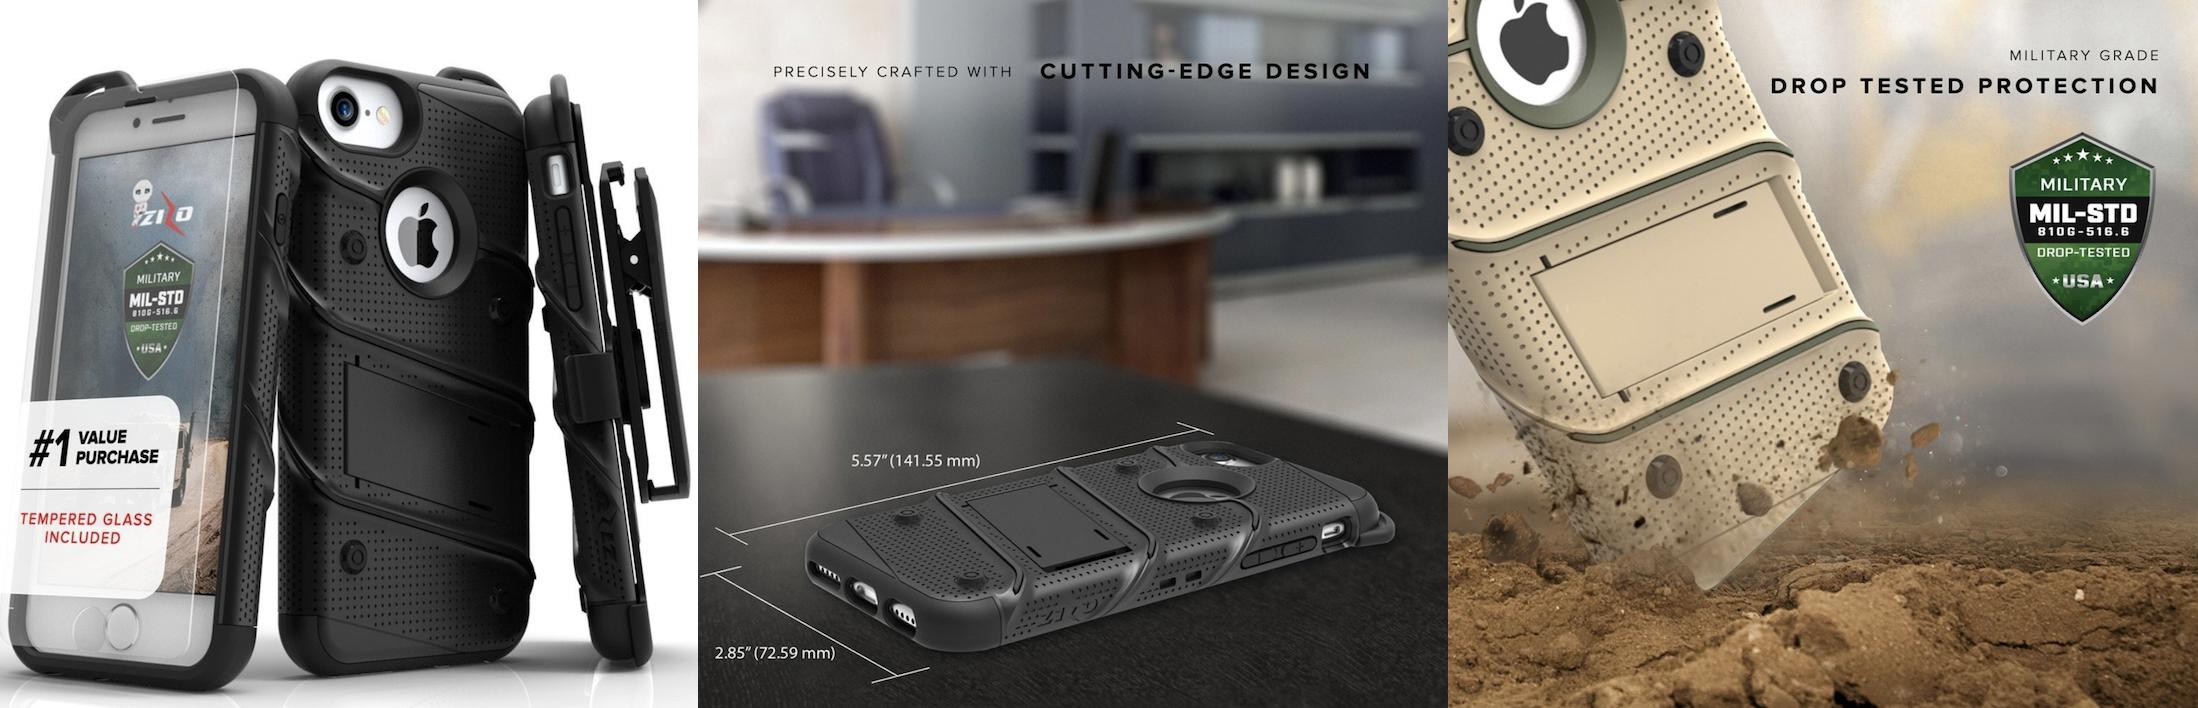 bolt iphone 8 case